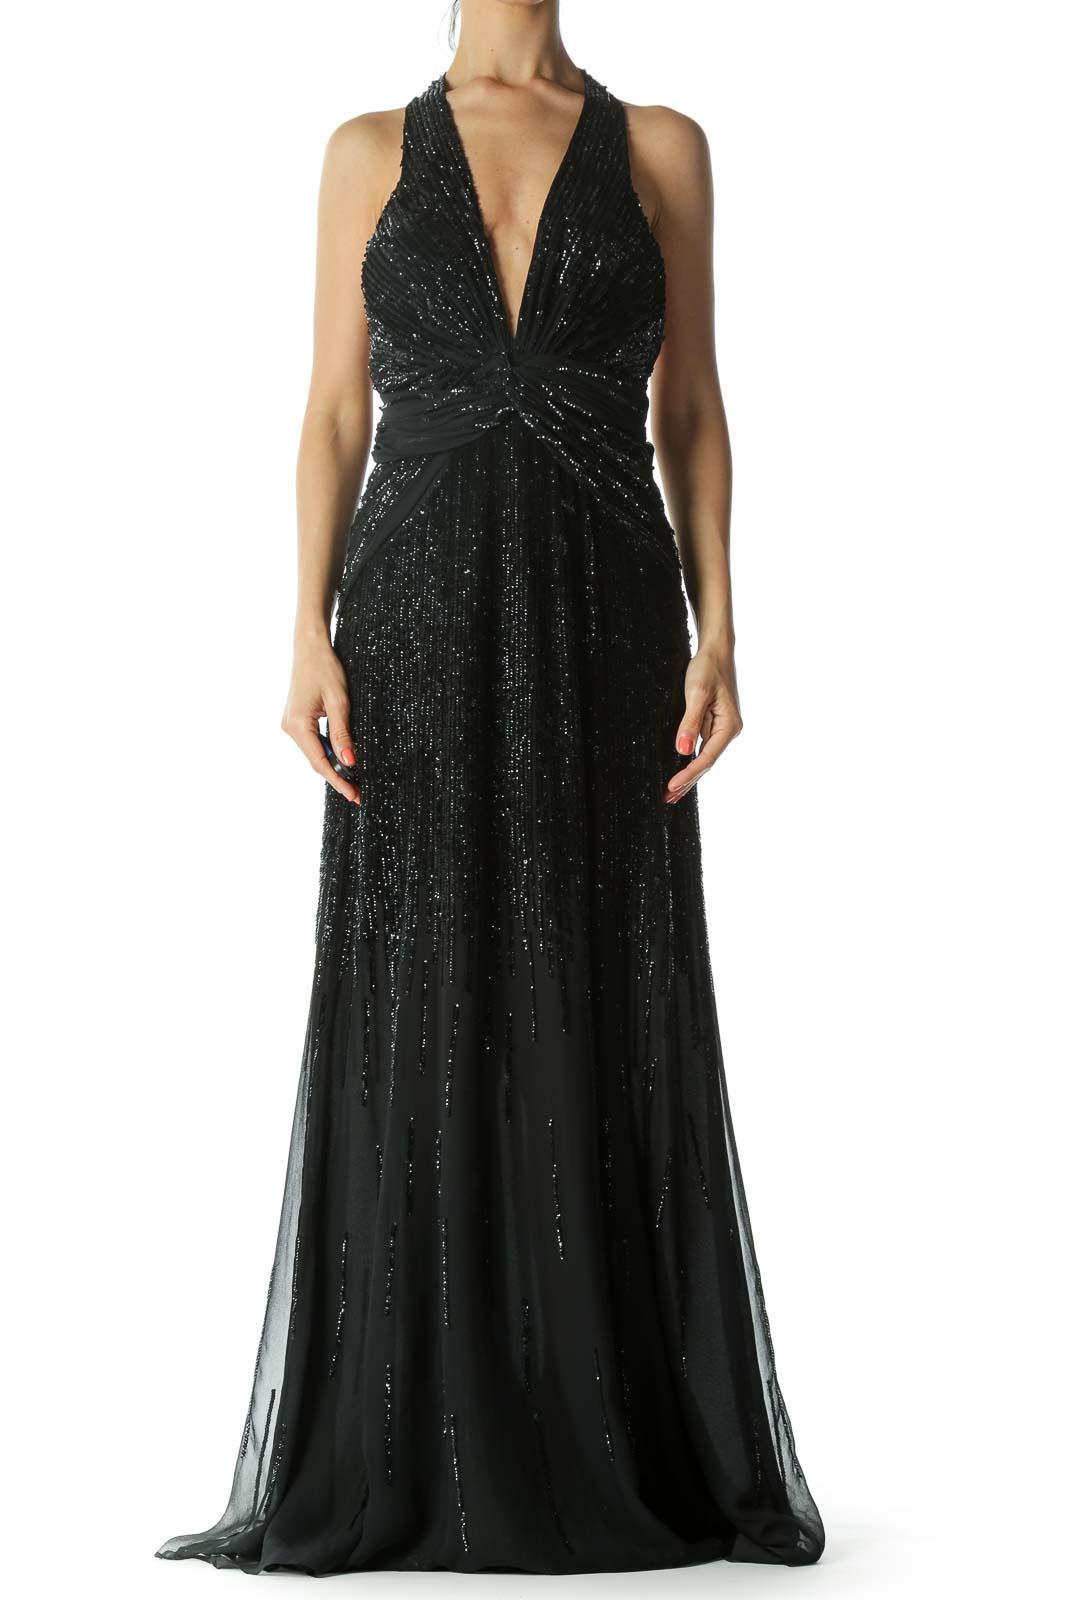 Black 100% Silk Sequined Halter-Neckline Front-Knot-Detail Evening Dress Front